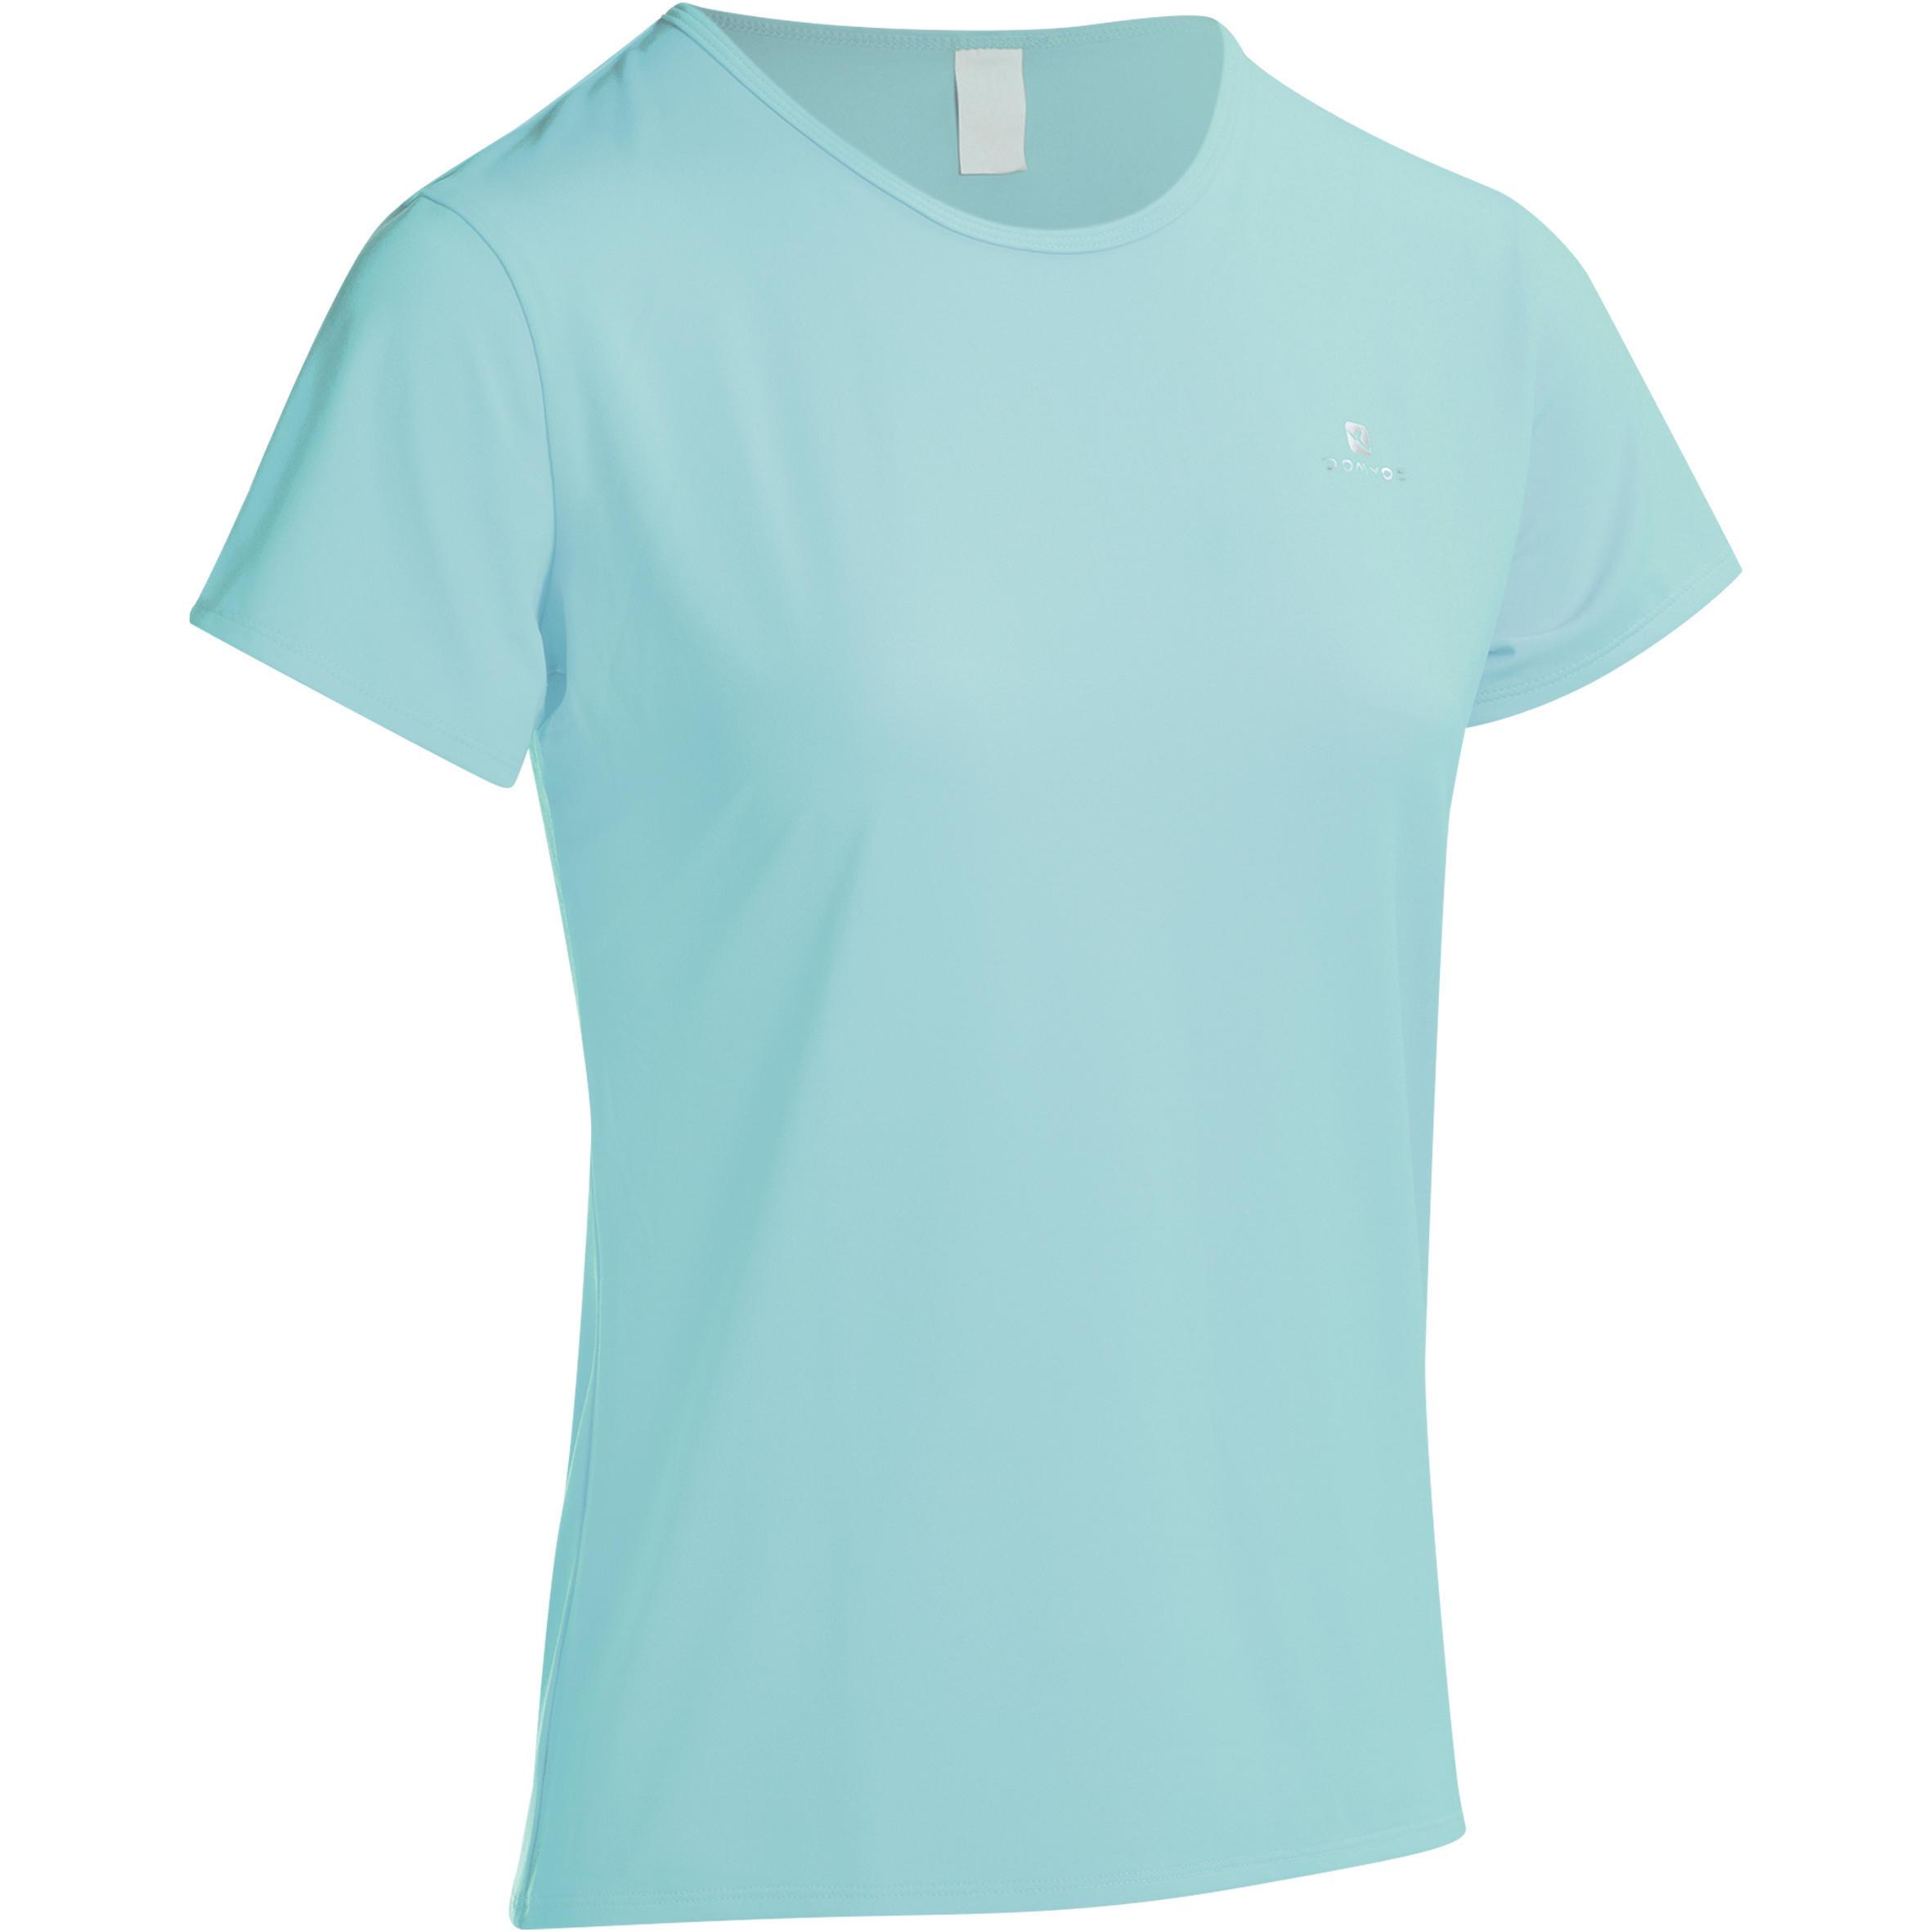 Energy Women's Cardio Fitness T-Shirt - Biru